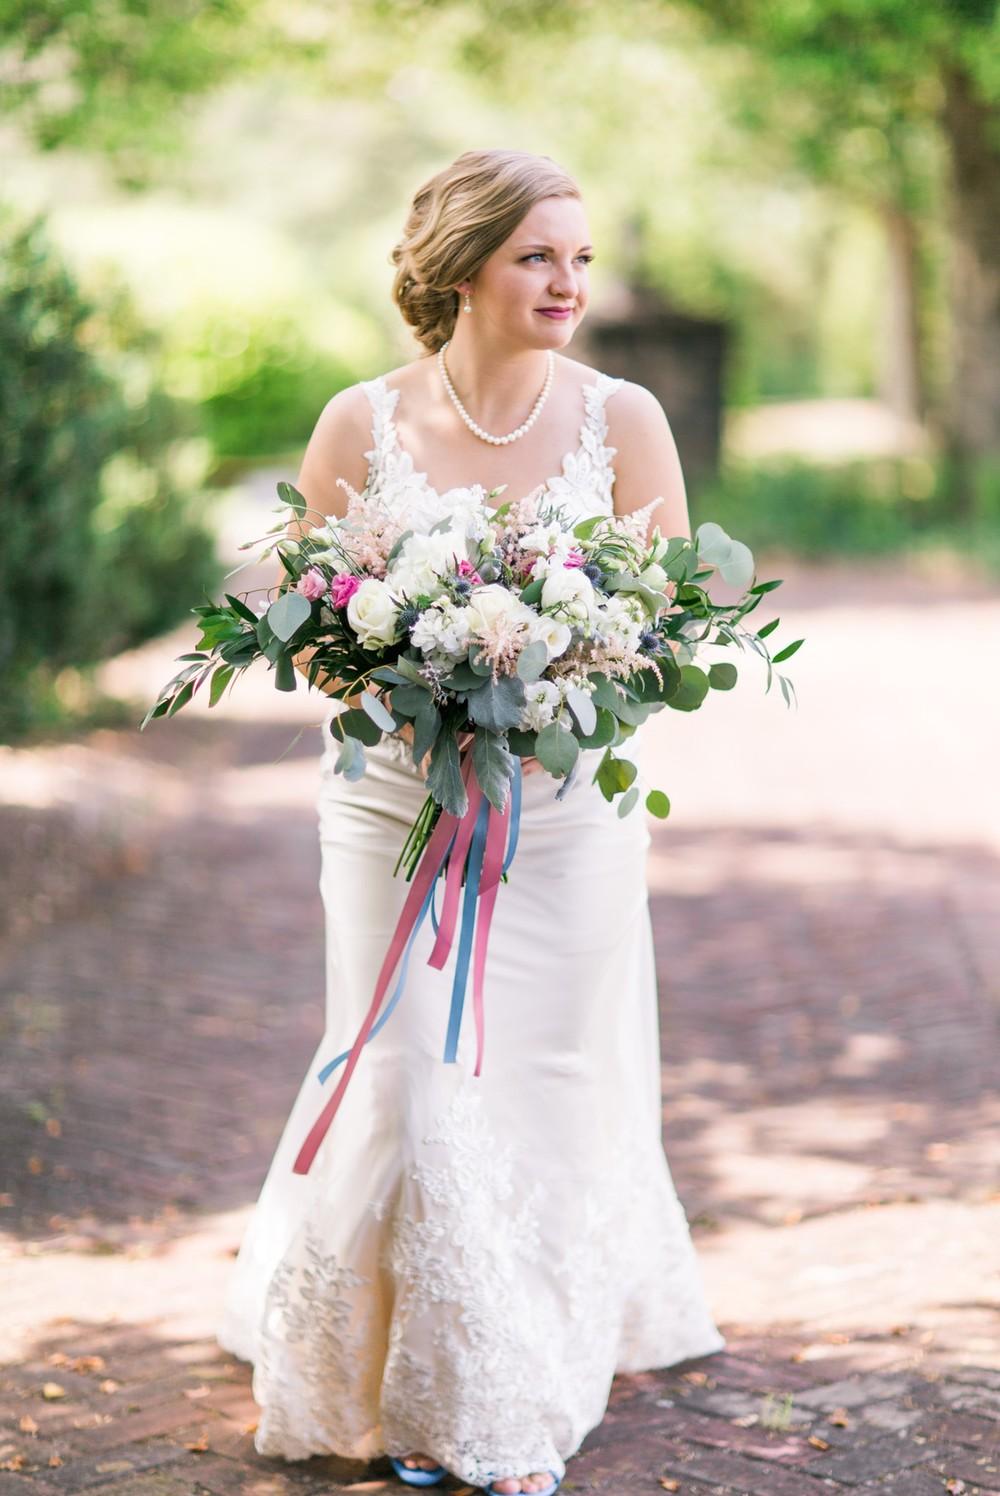 trivium_lynchburg_va_wedding_estate_wedding_photography_wedding_photographers (35).jpg